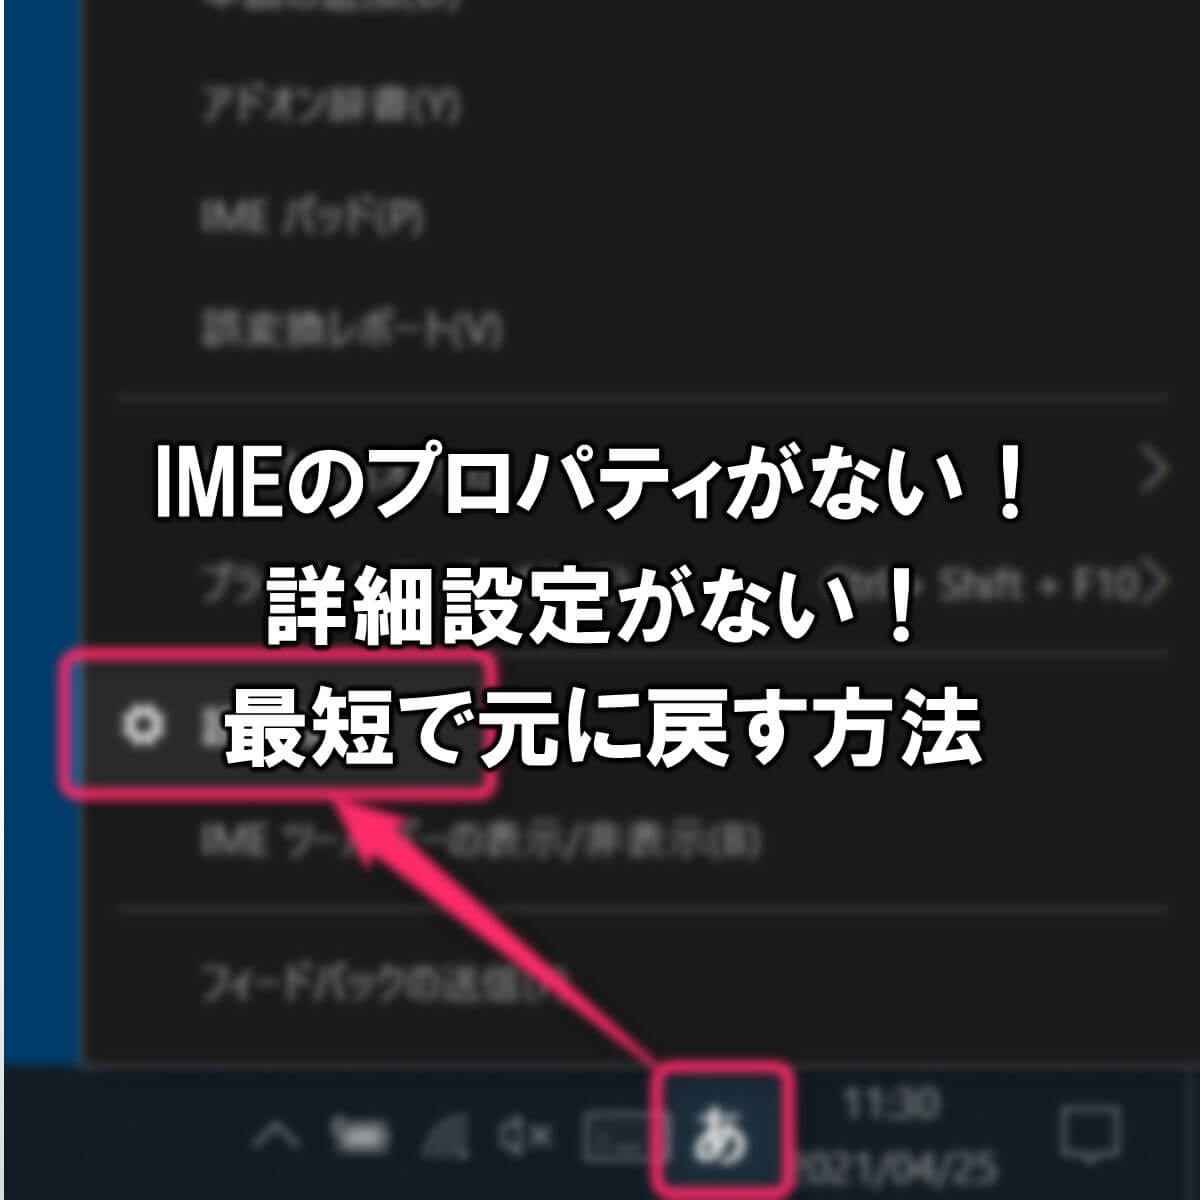 Windows 10 IME IMEのプロパティがない!詳細設定がない!最短で元に戻す方法